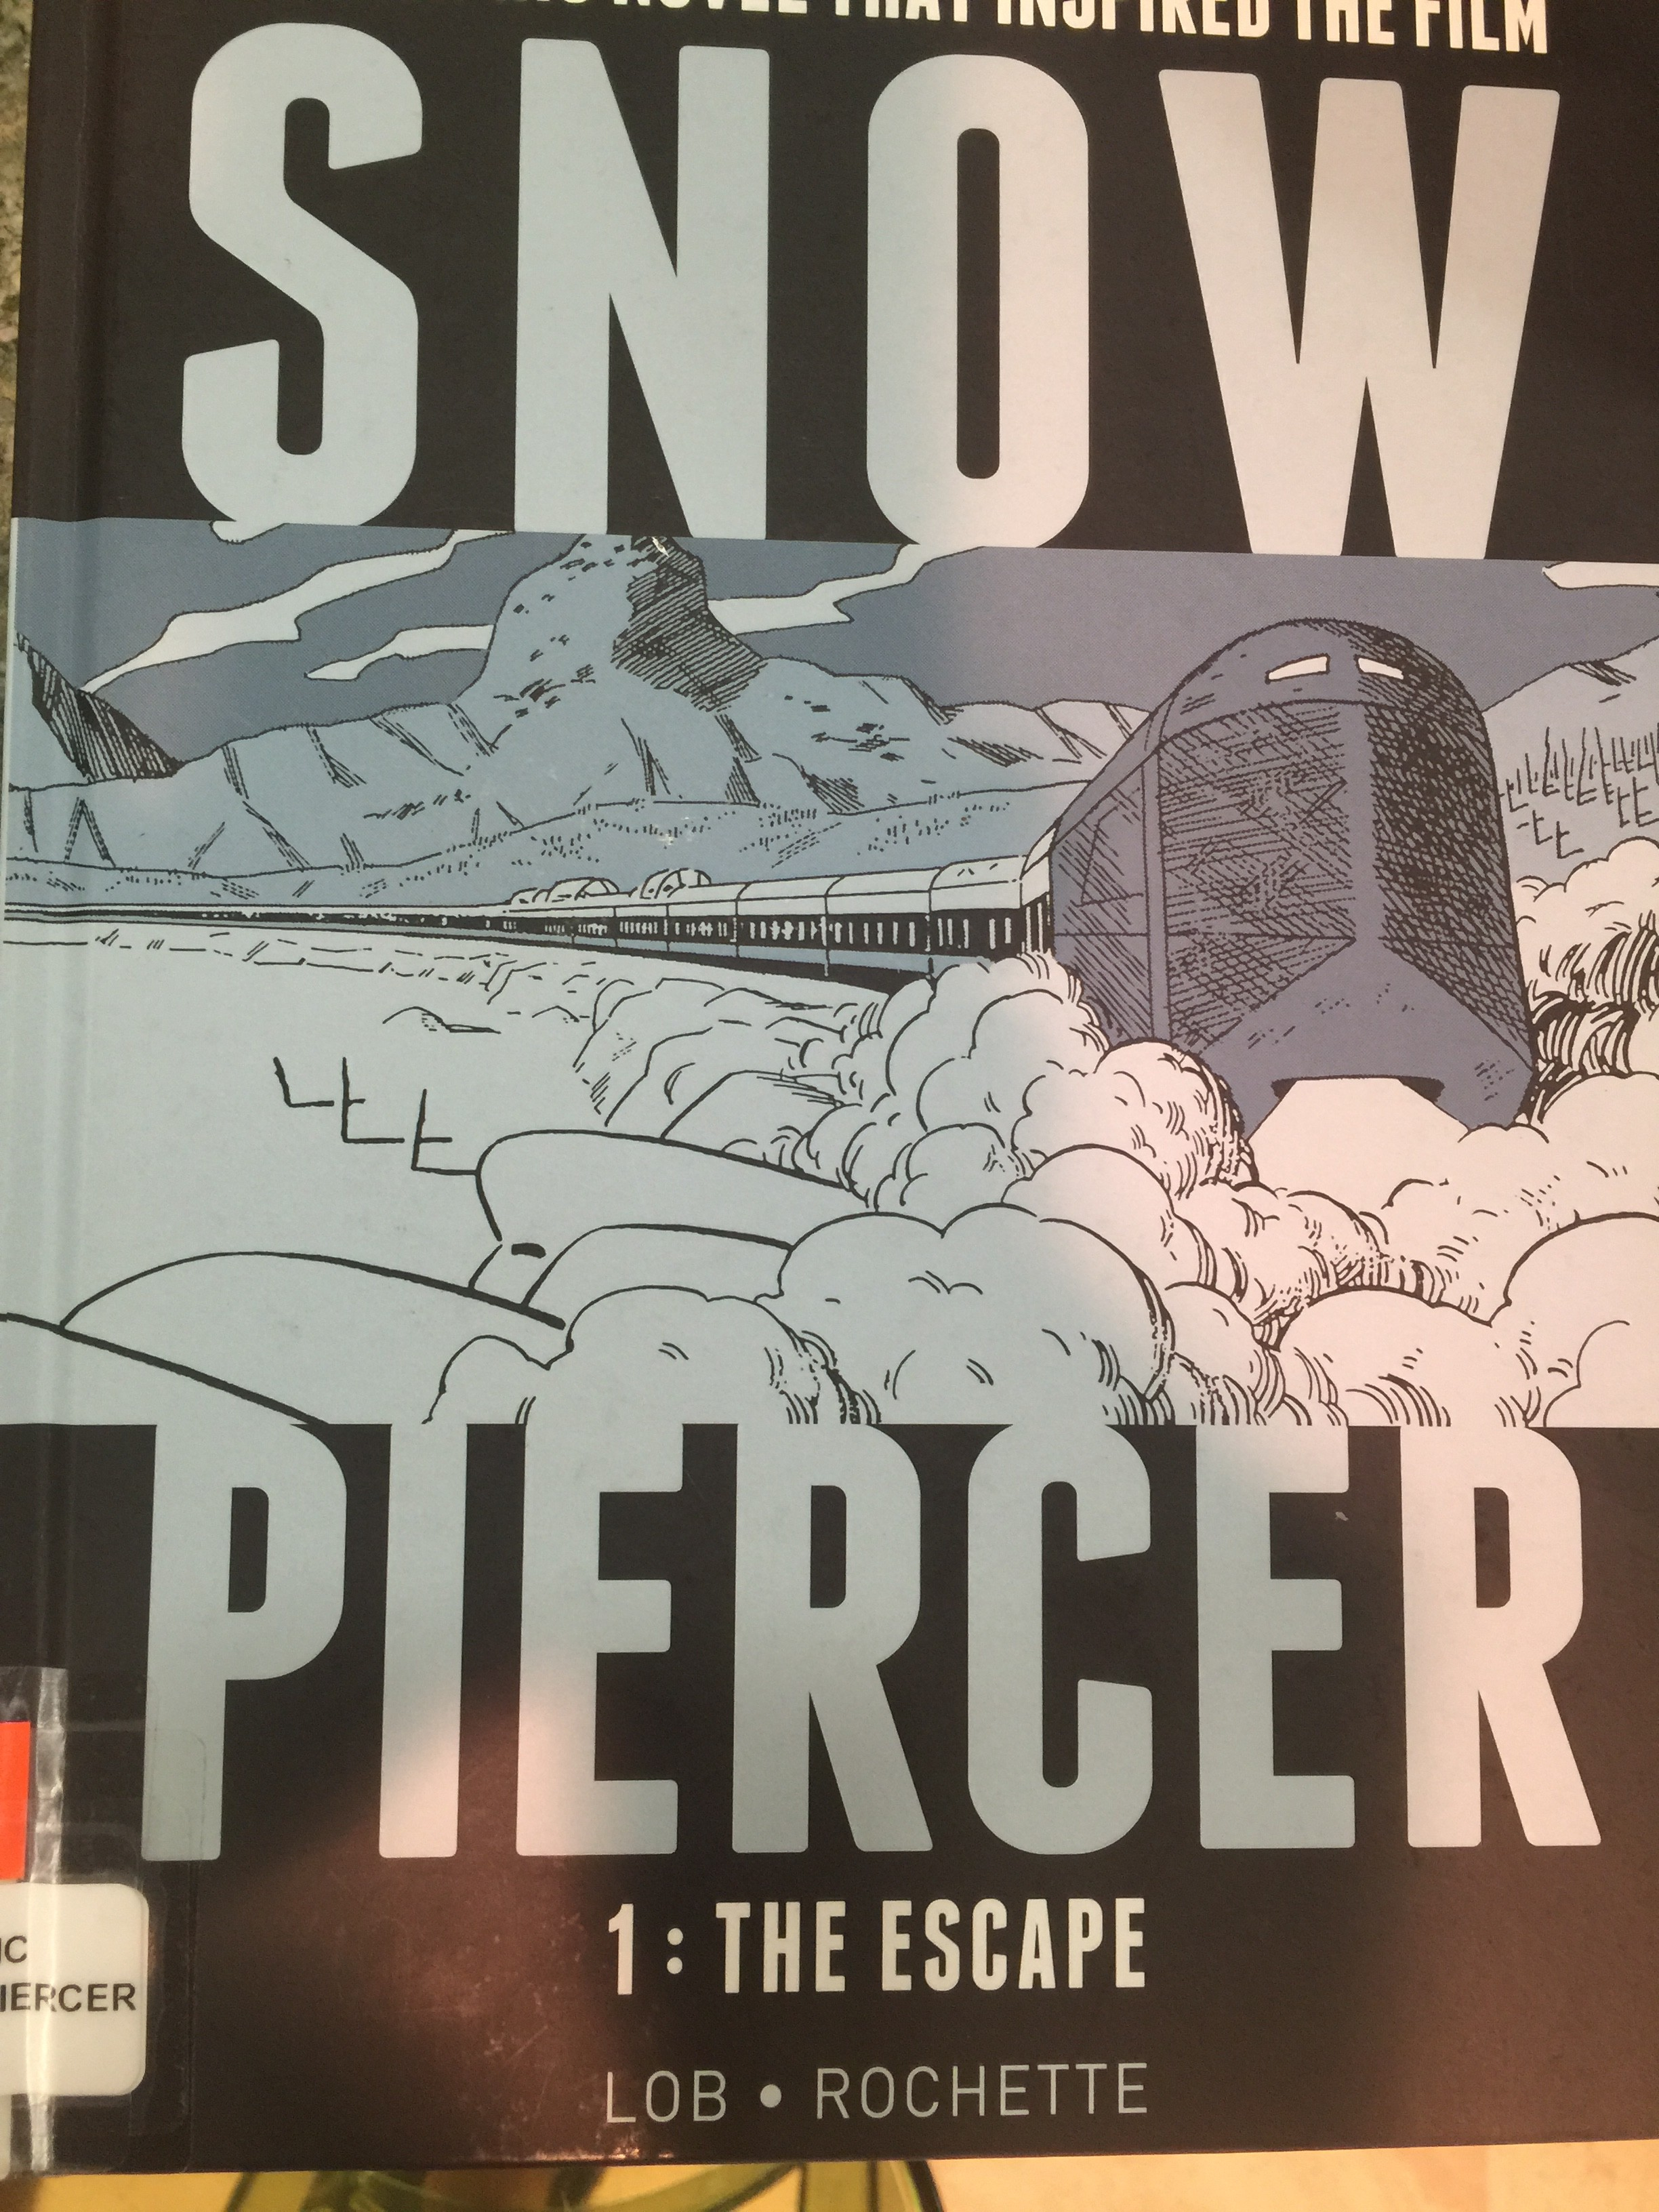 snow piecer